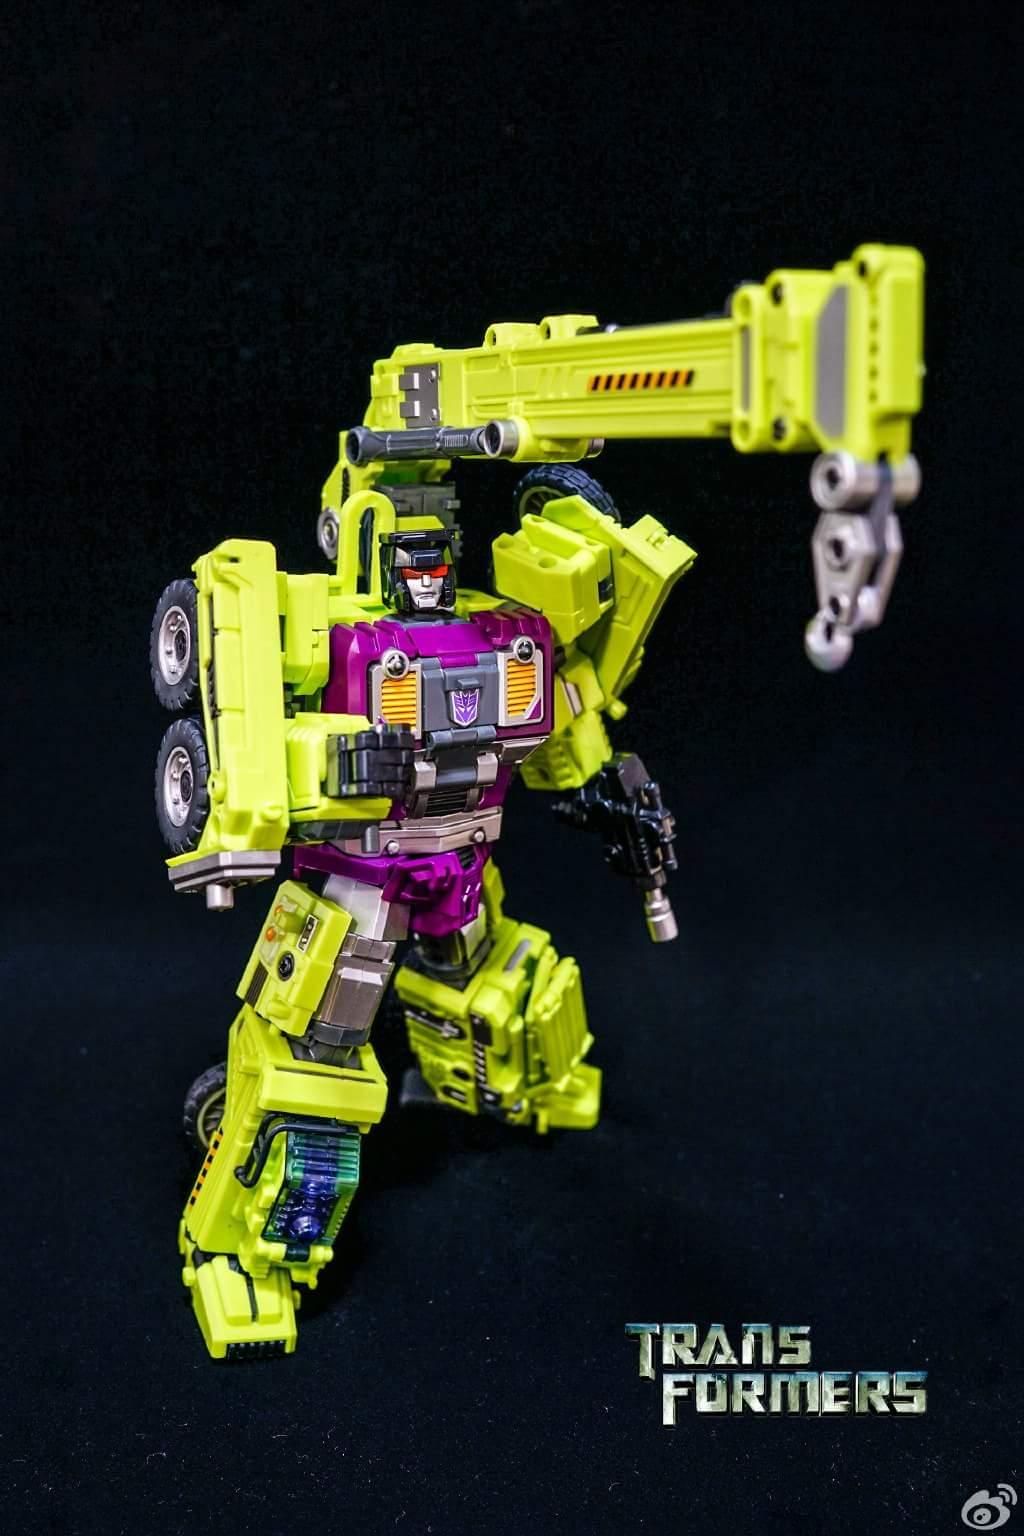 [Generation Toy] Produit Tiers - Jouet GT-01 Gravity Builder - aka Devastator/Dévastateur - Page 4 0dURjD5M